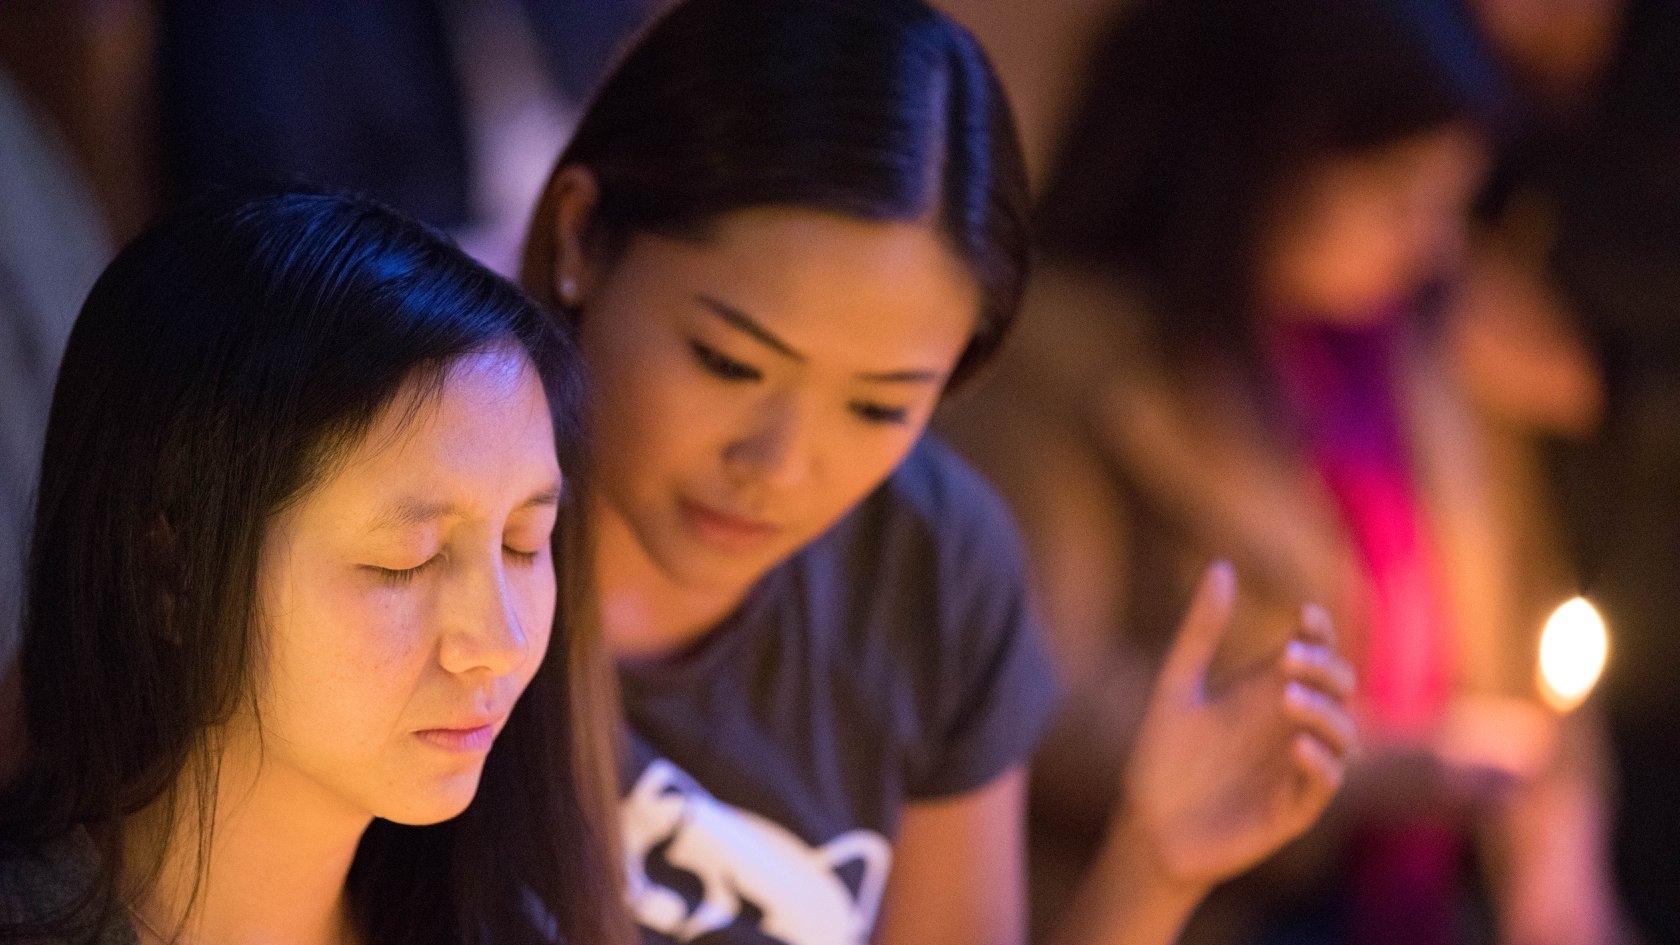 prayer & Fasting - Deepening